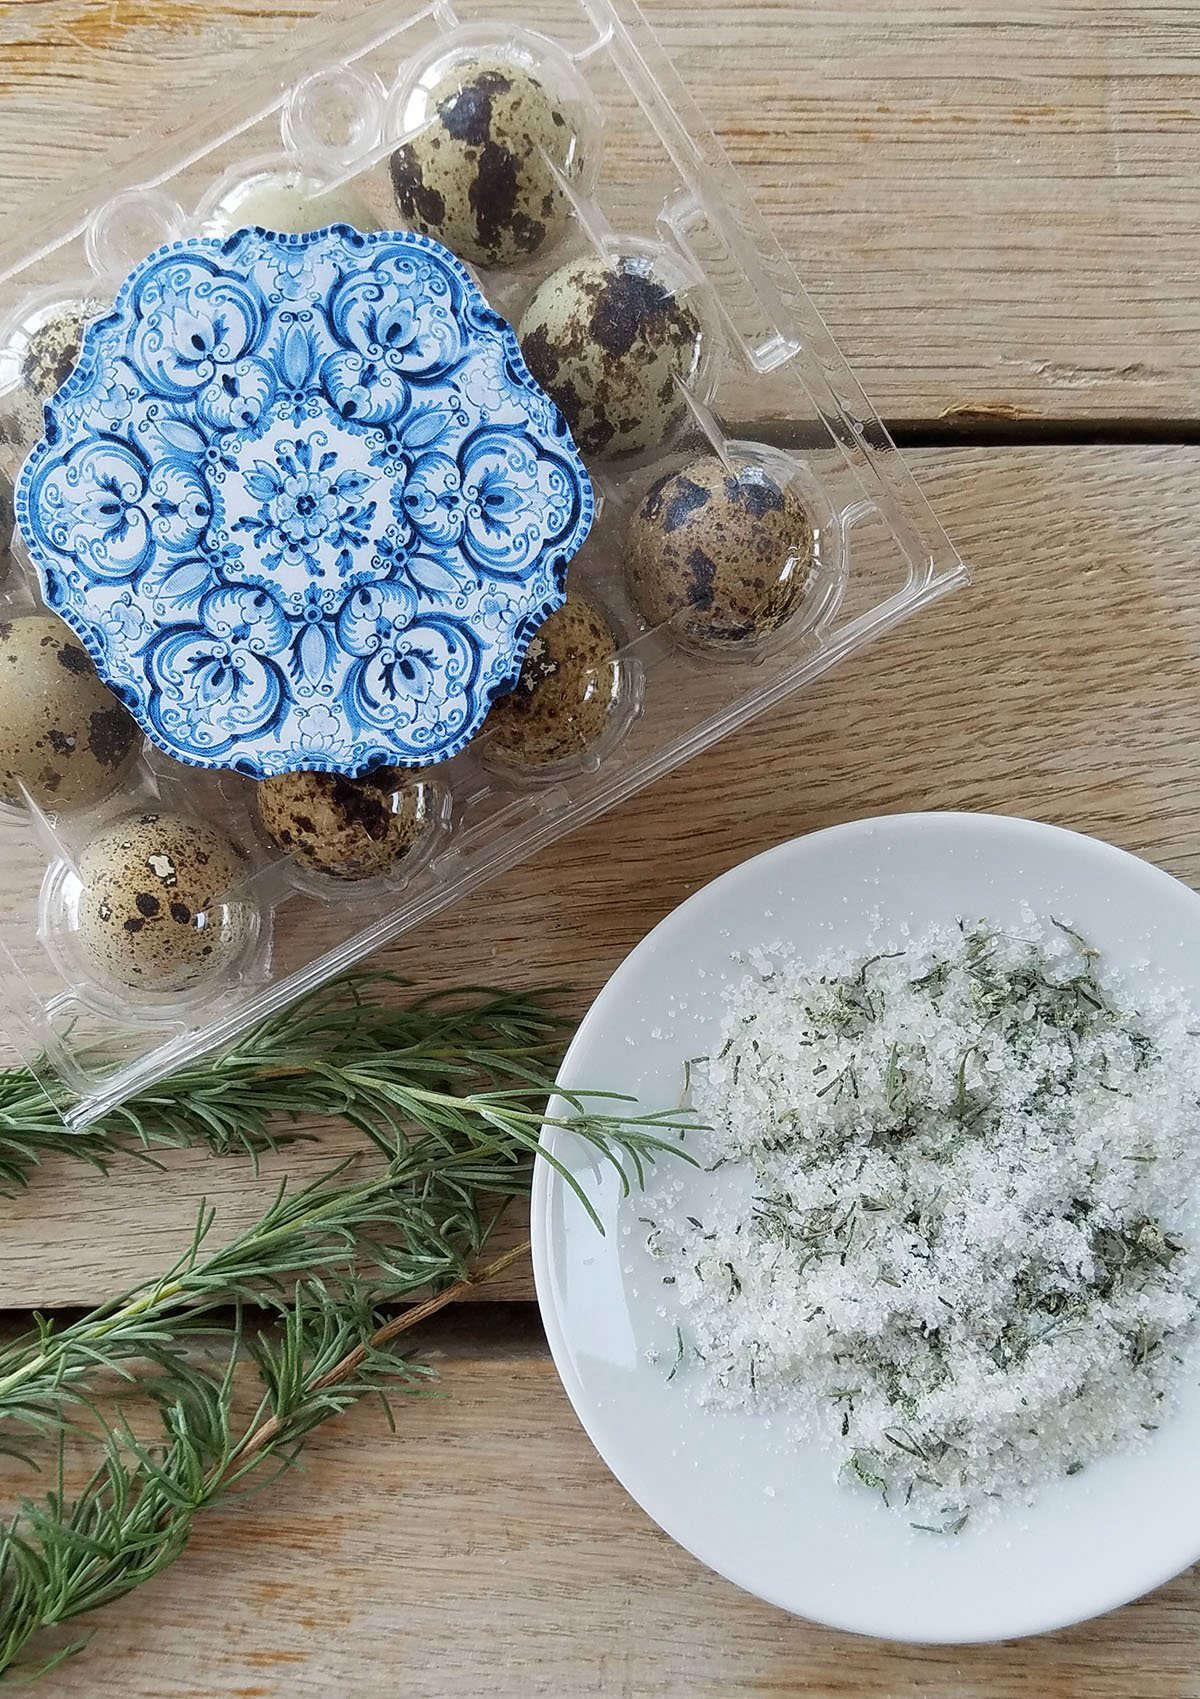 Quails eggs and dipping salt by Marie Viljoen